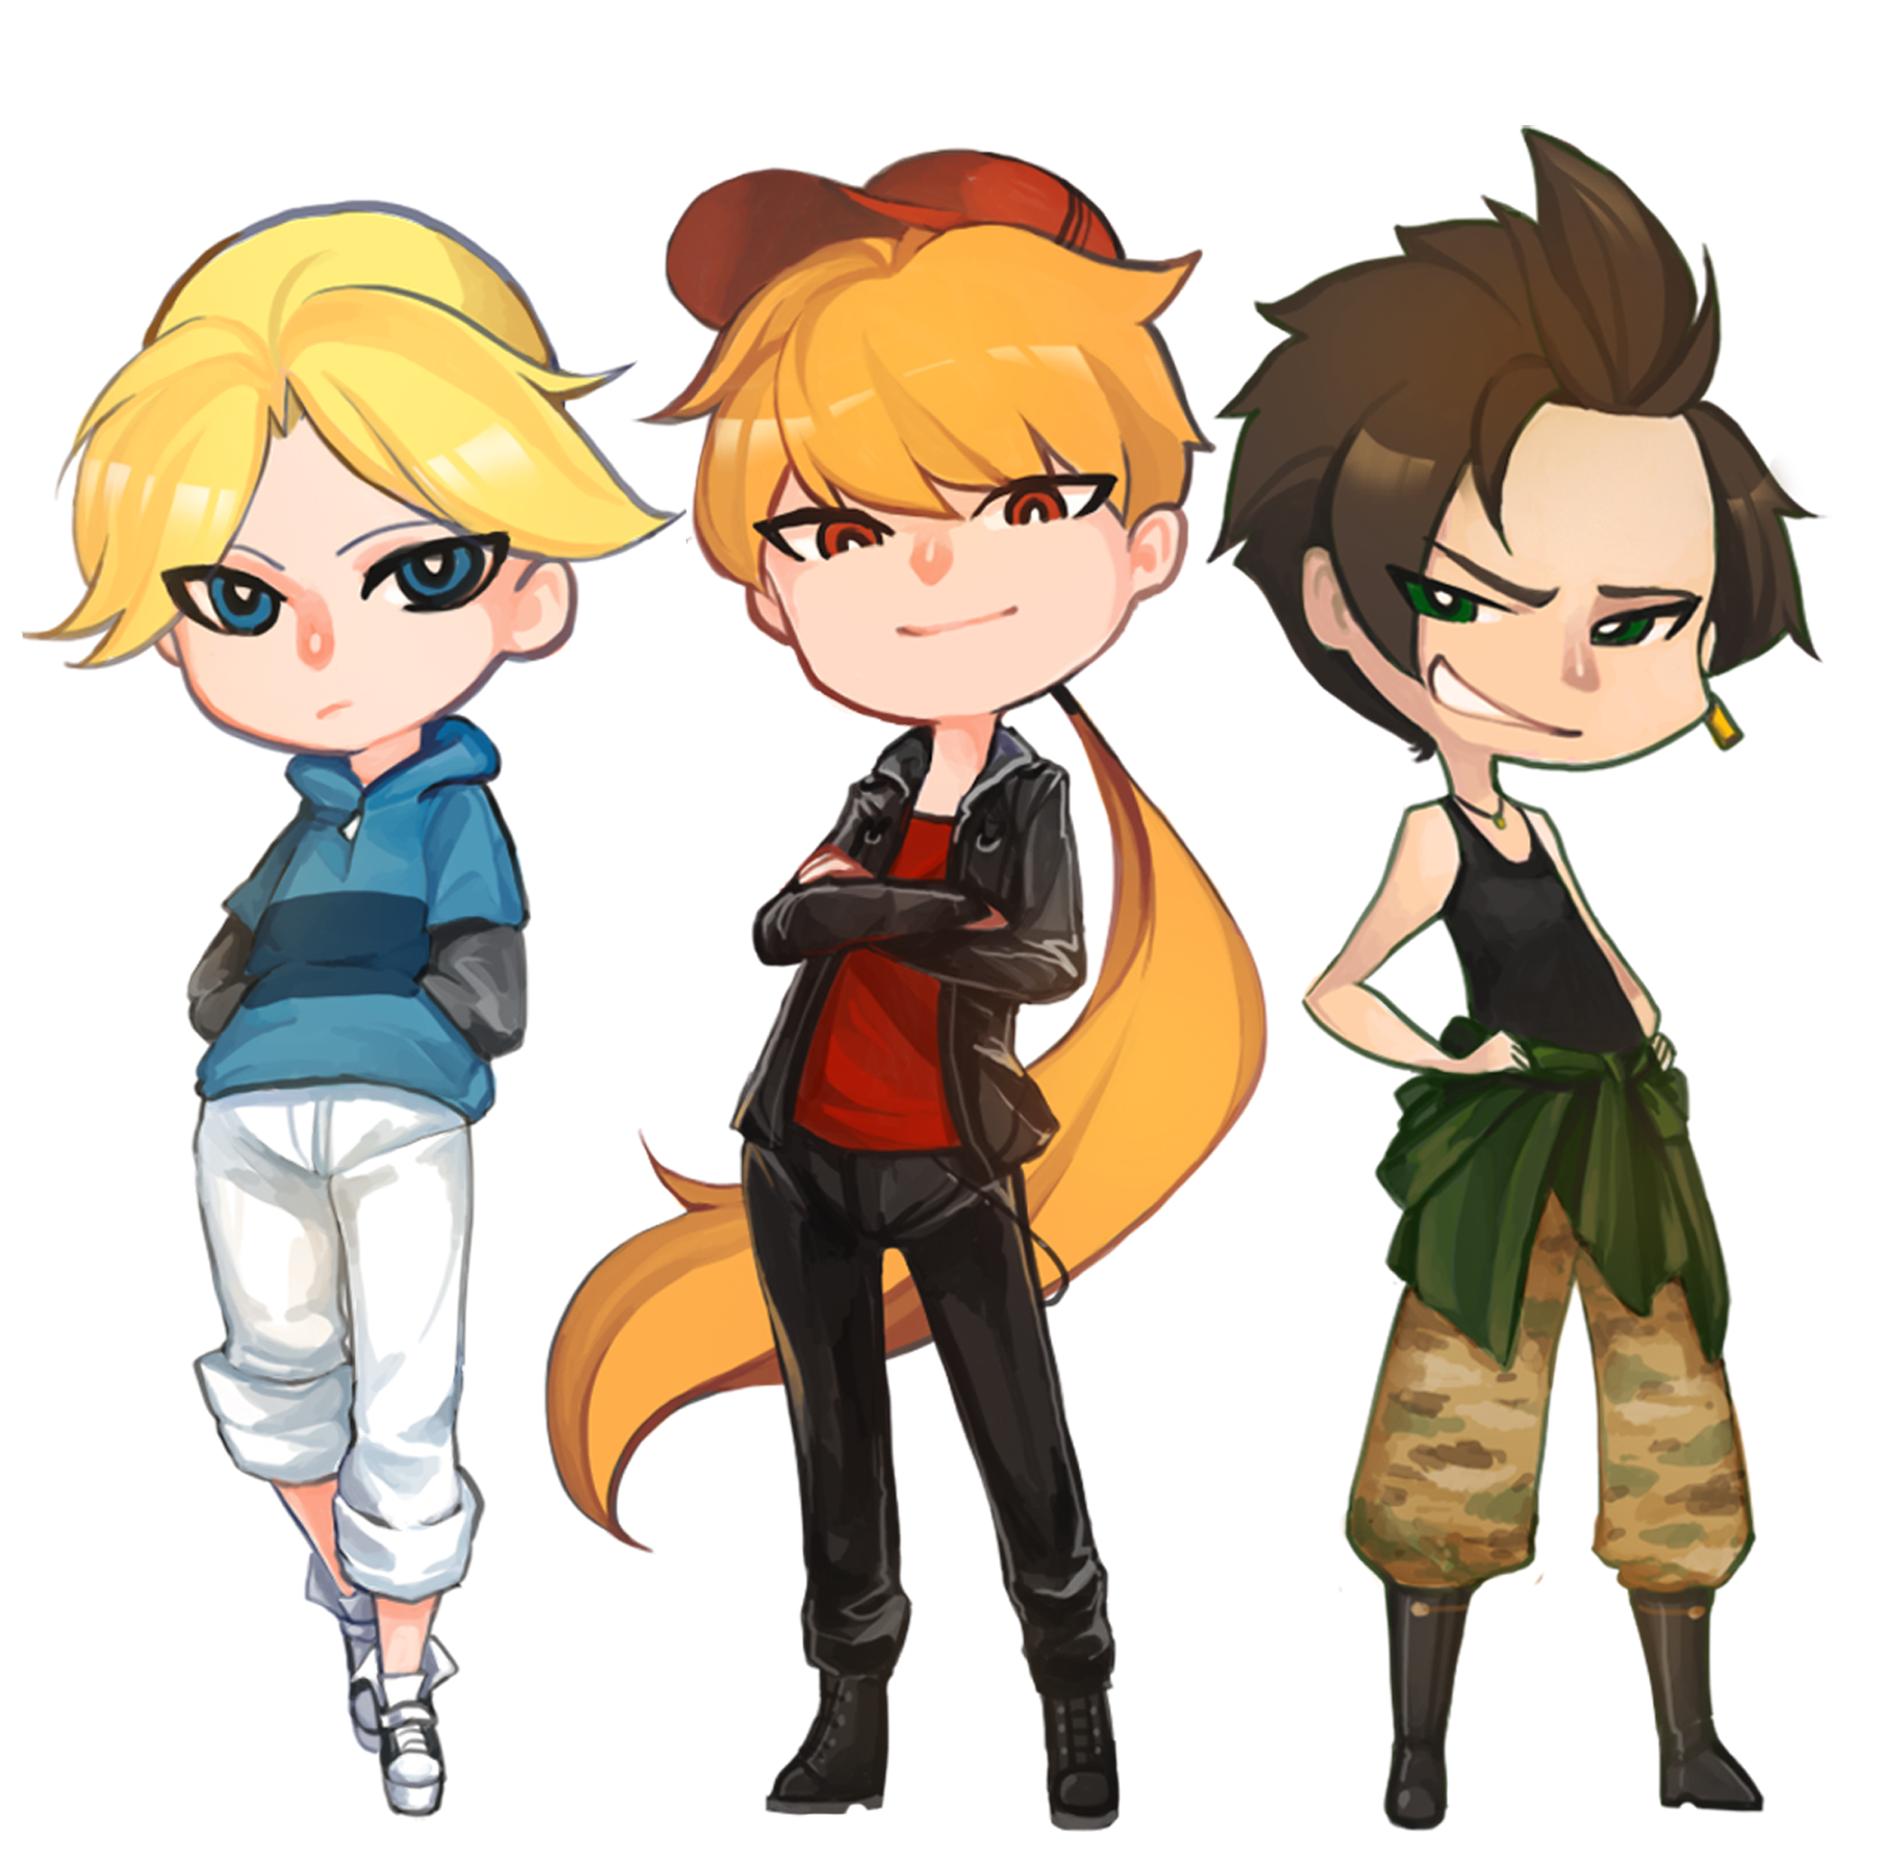 Super Y Cartoon Characters : Boomer brick and butch powerpuff girls cartoon